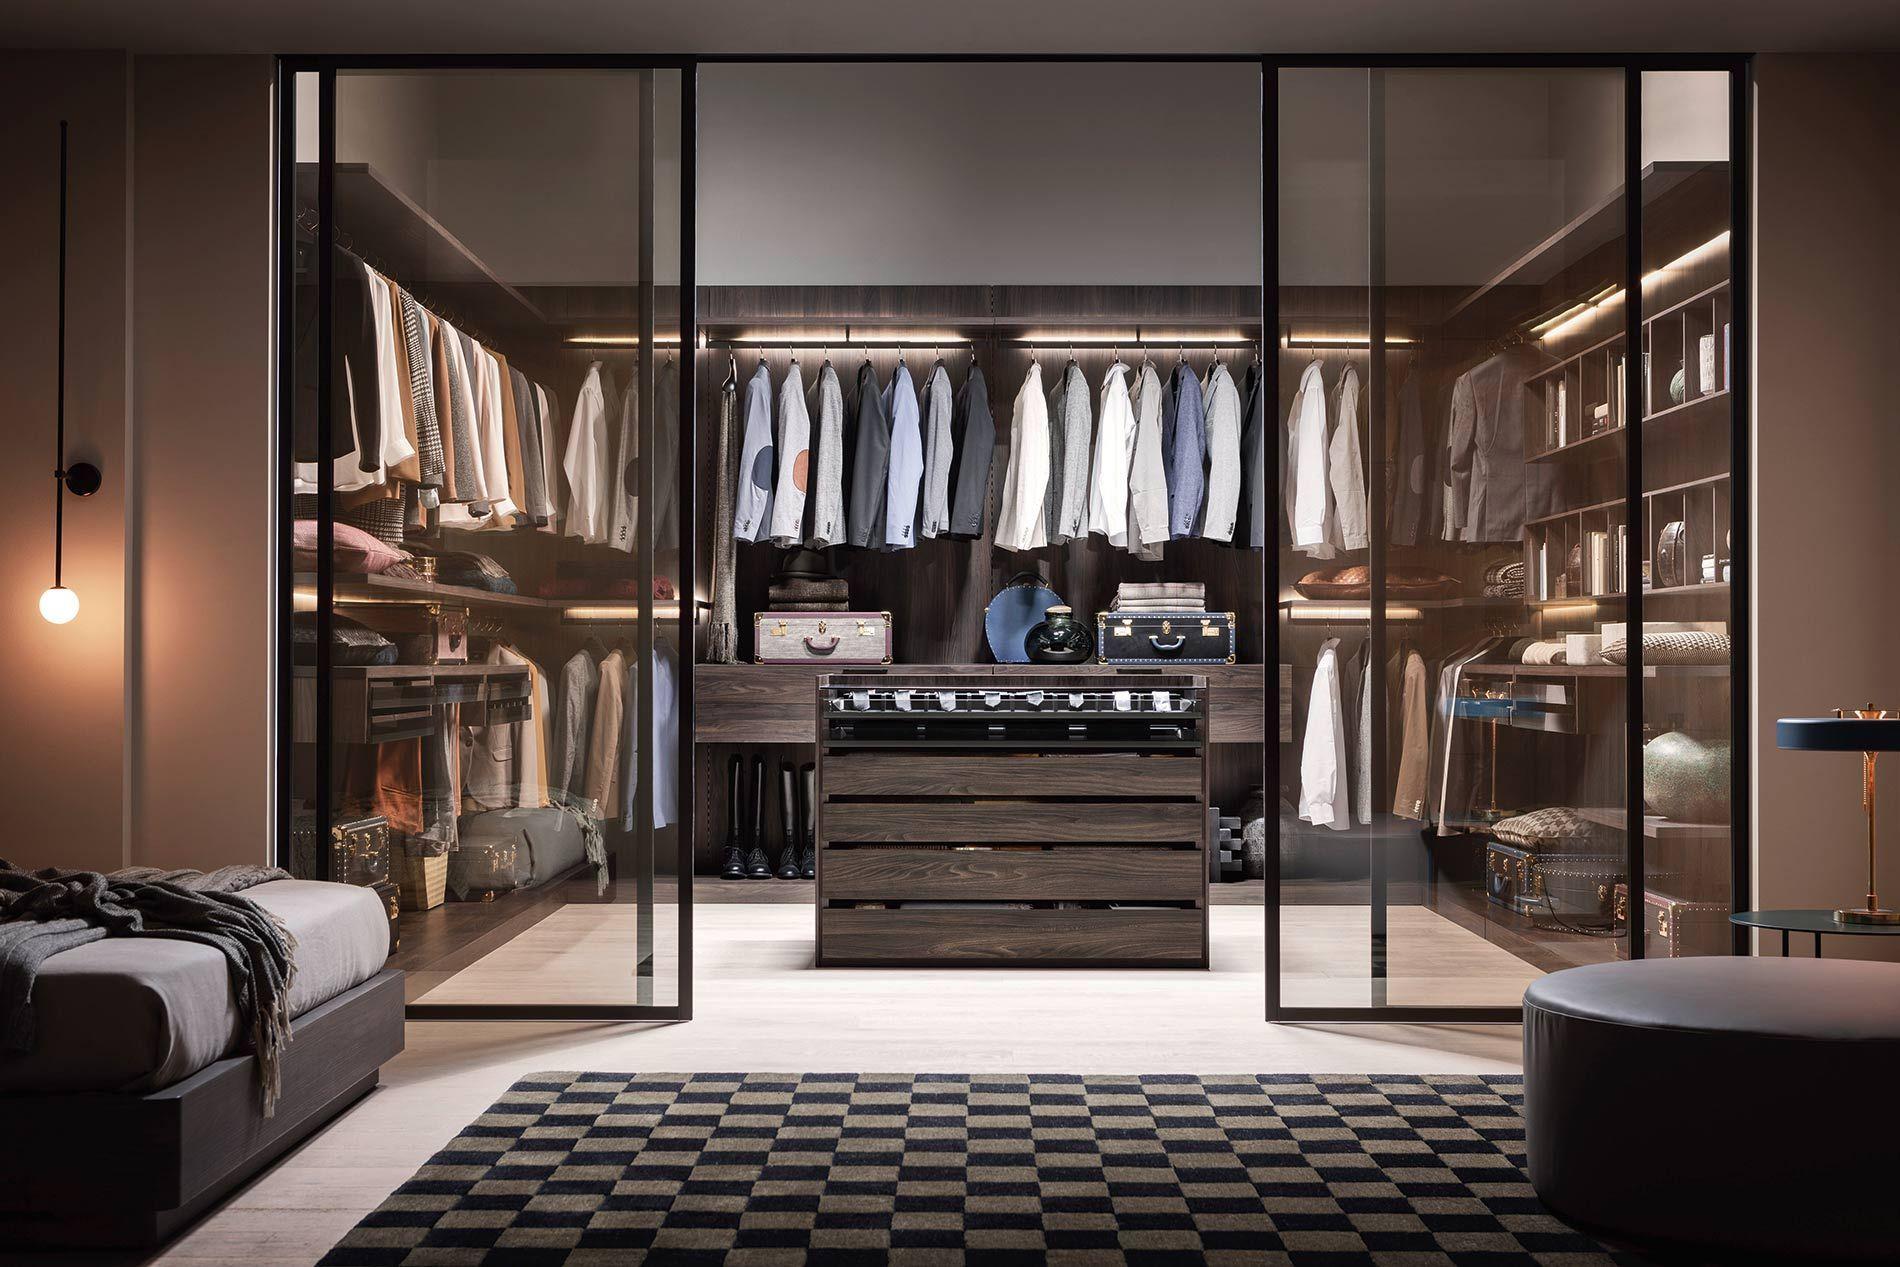 Luxus Ankleidezimmer Slaapkamerkleuren Dressing Room Design